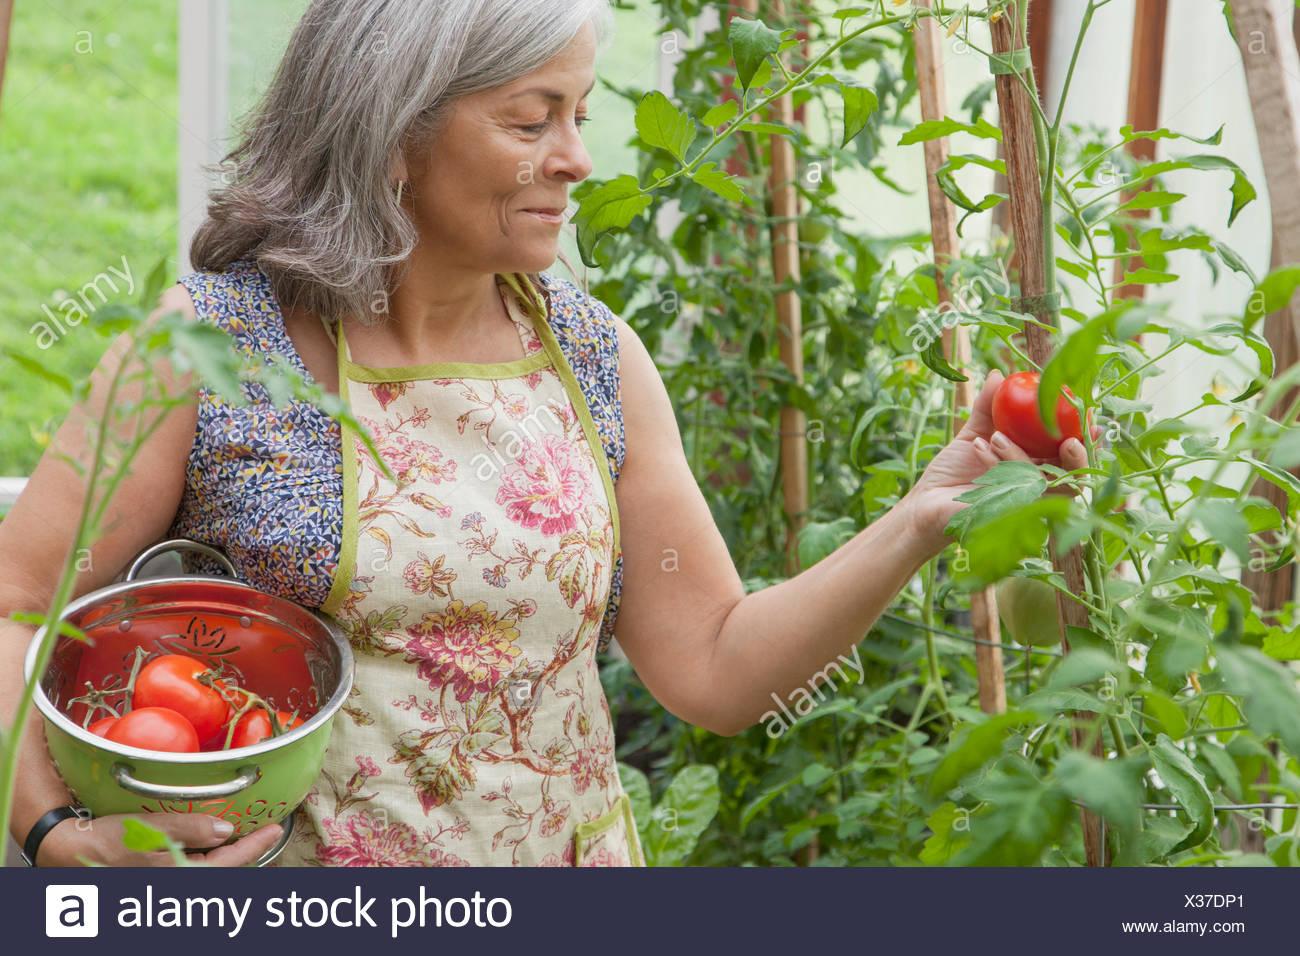 senior woman picking tomatoes in greenhouse garden - Stock Image